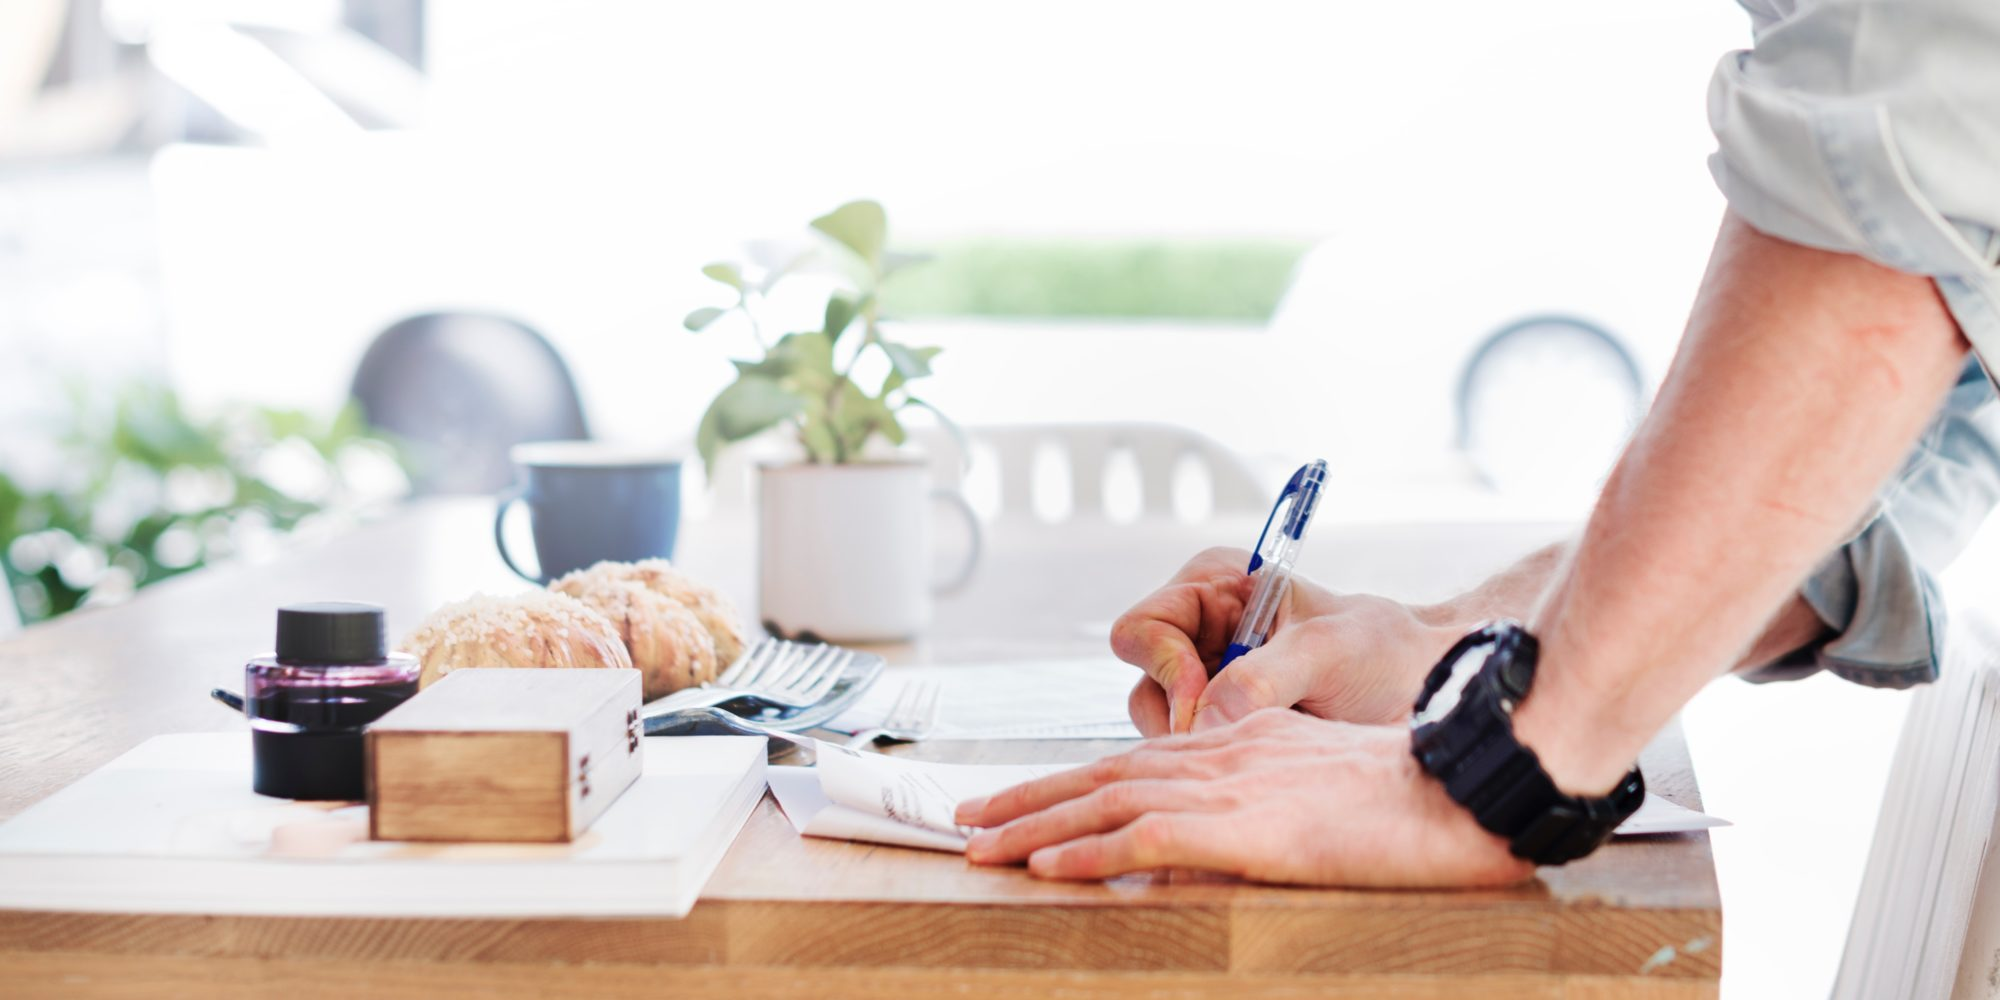 blogging ebook, guides, cheatsheet, templates